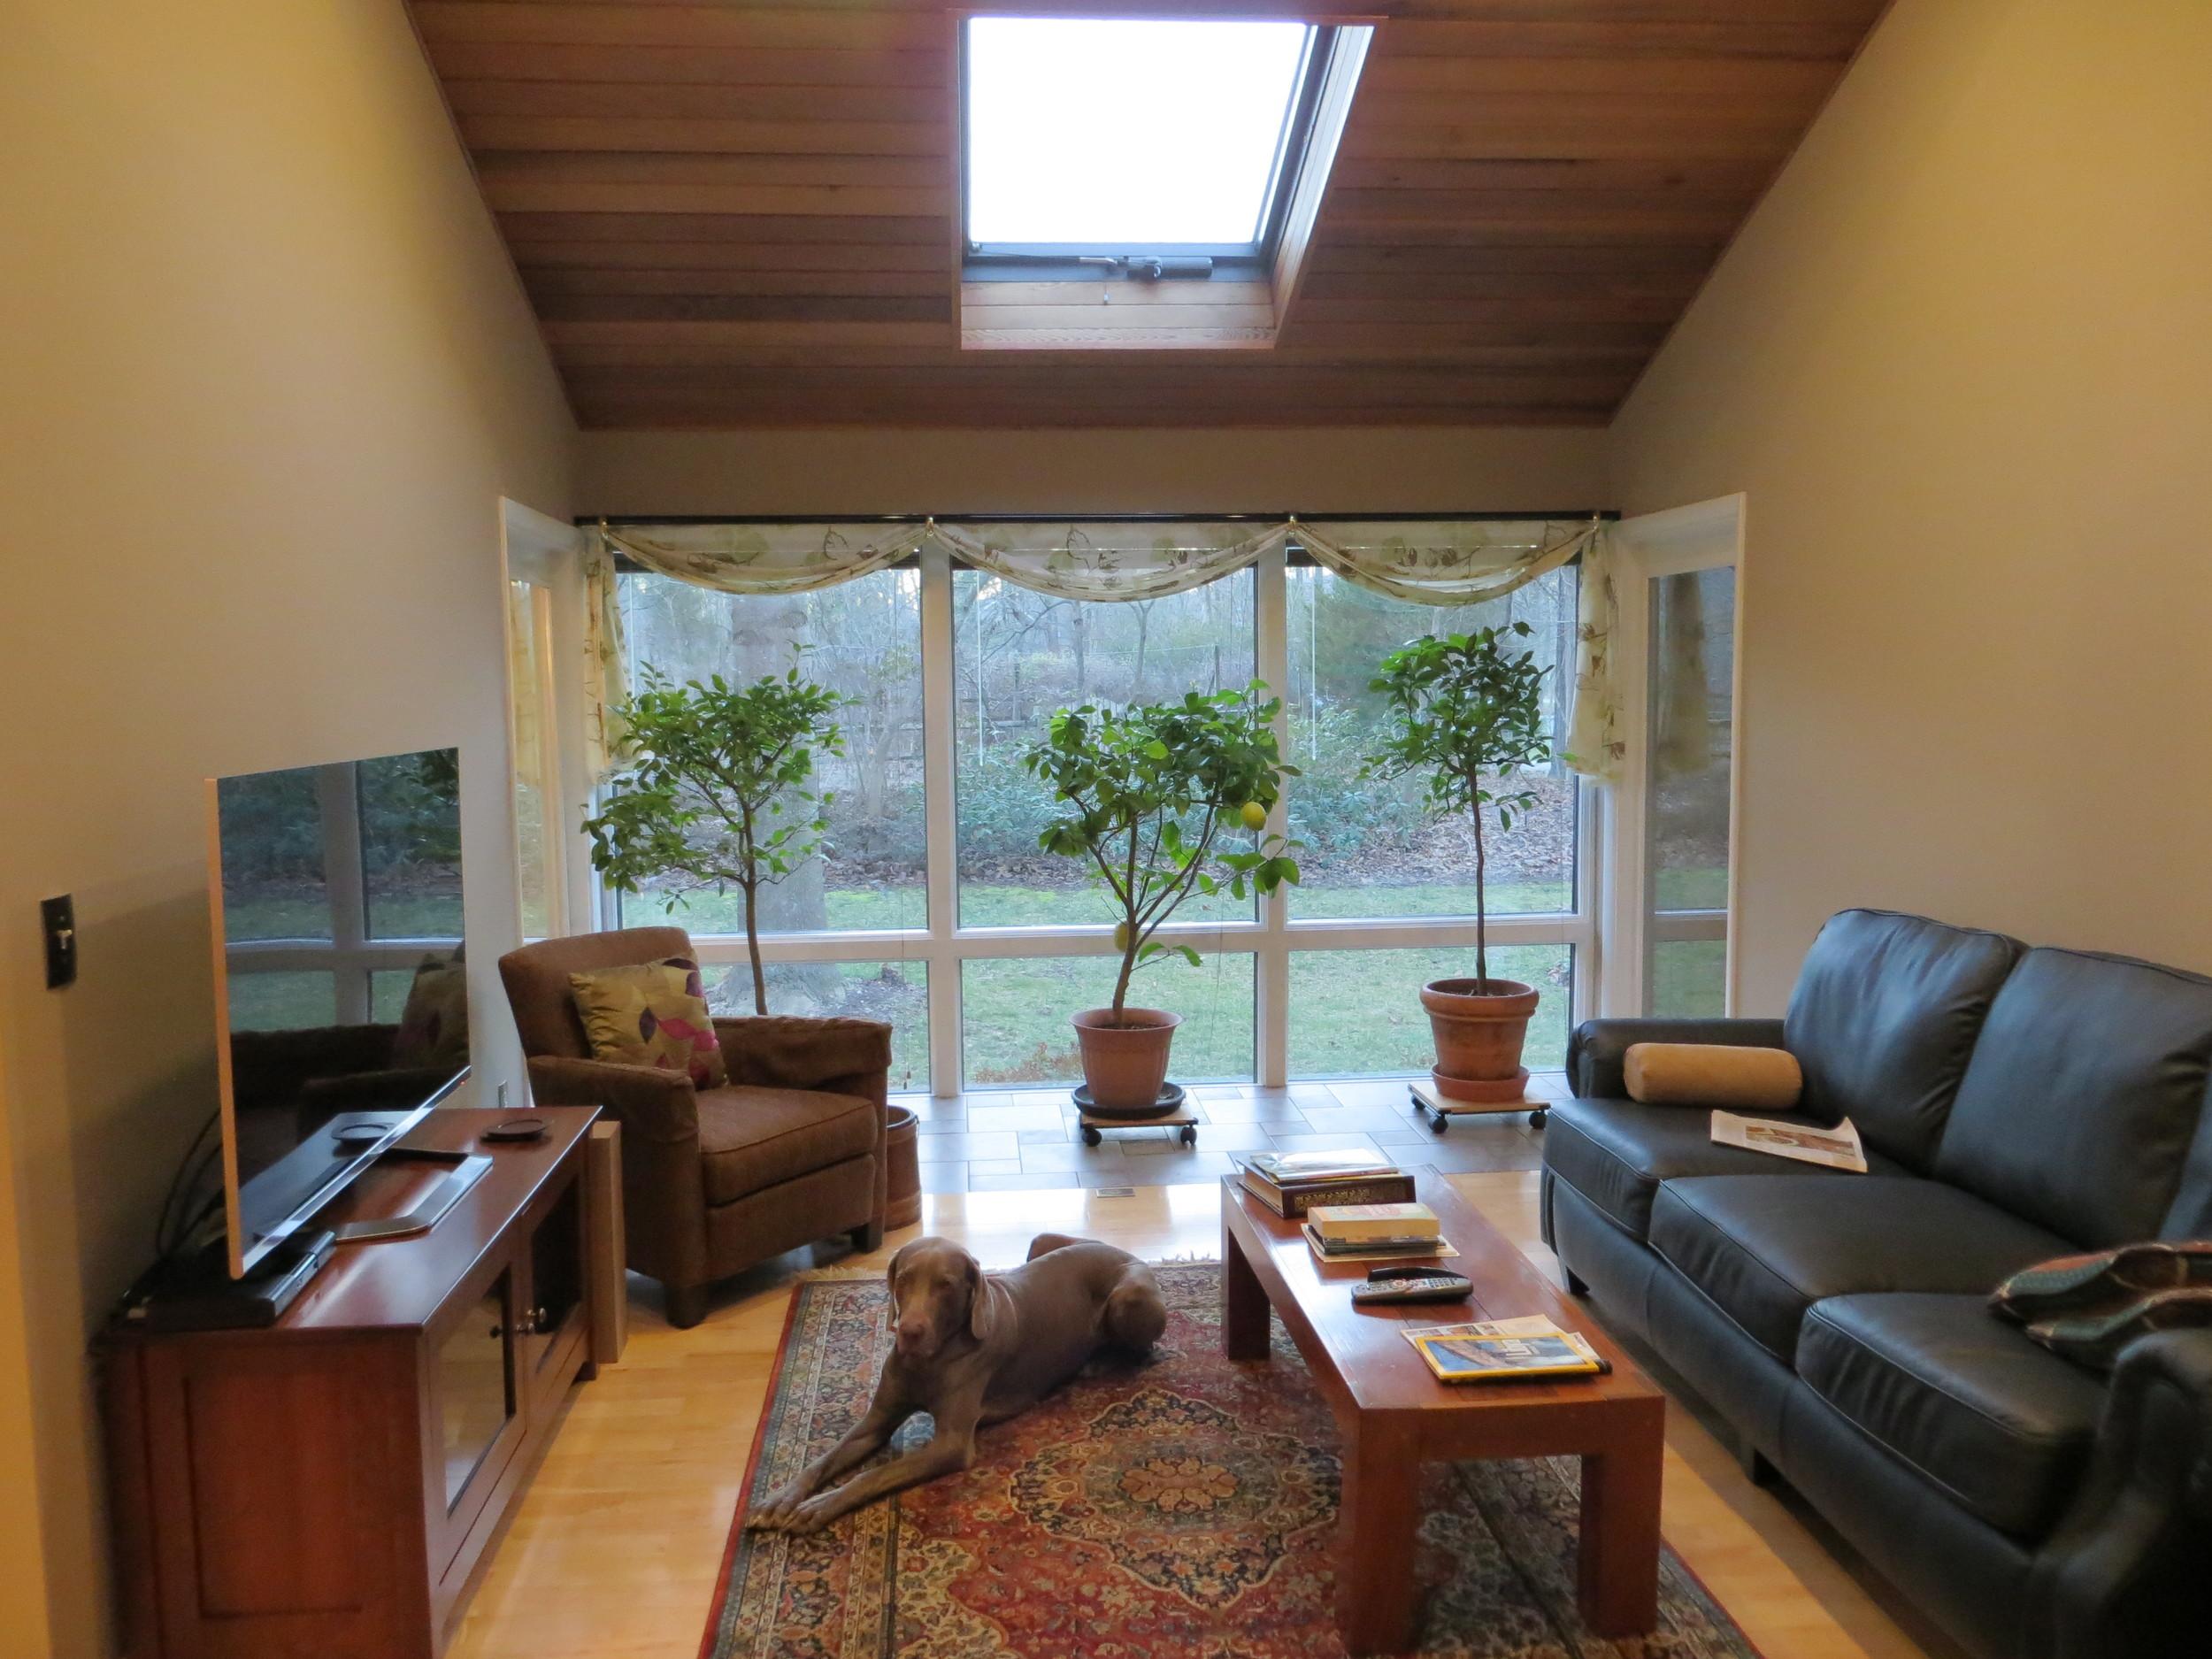 Living Room with Window Wall